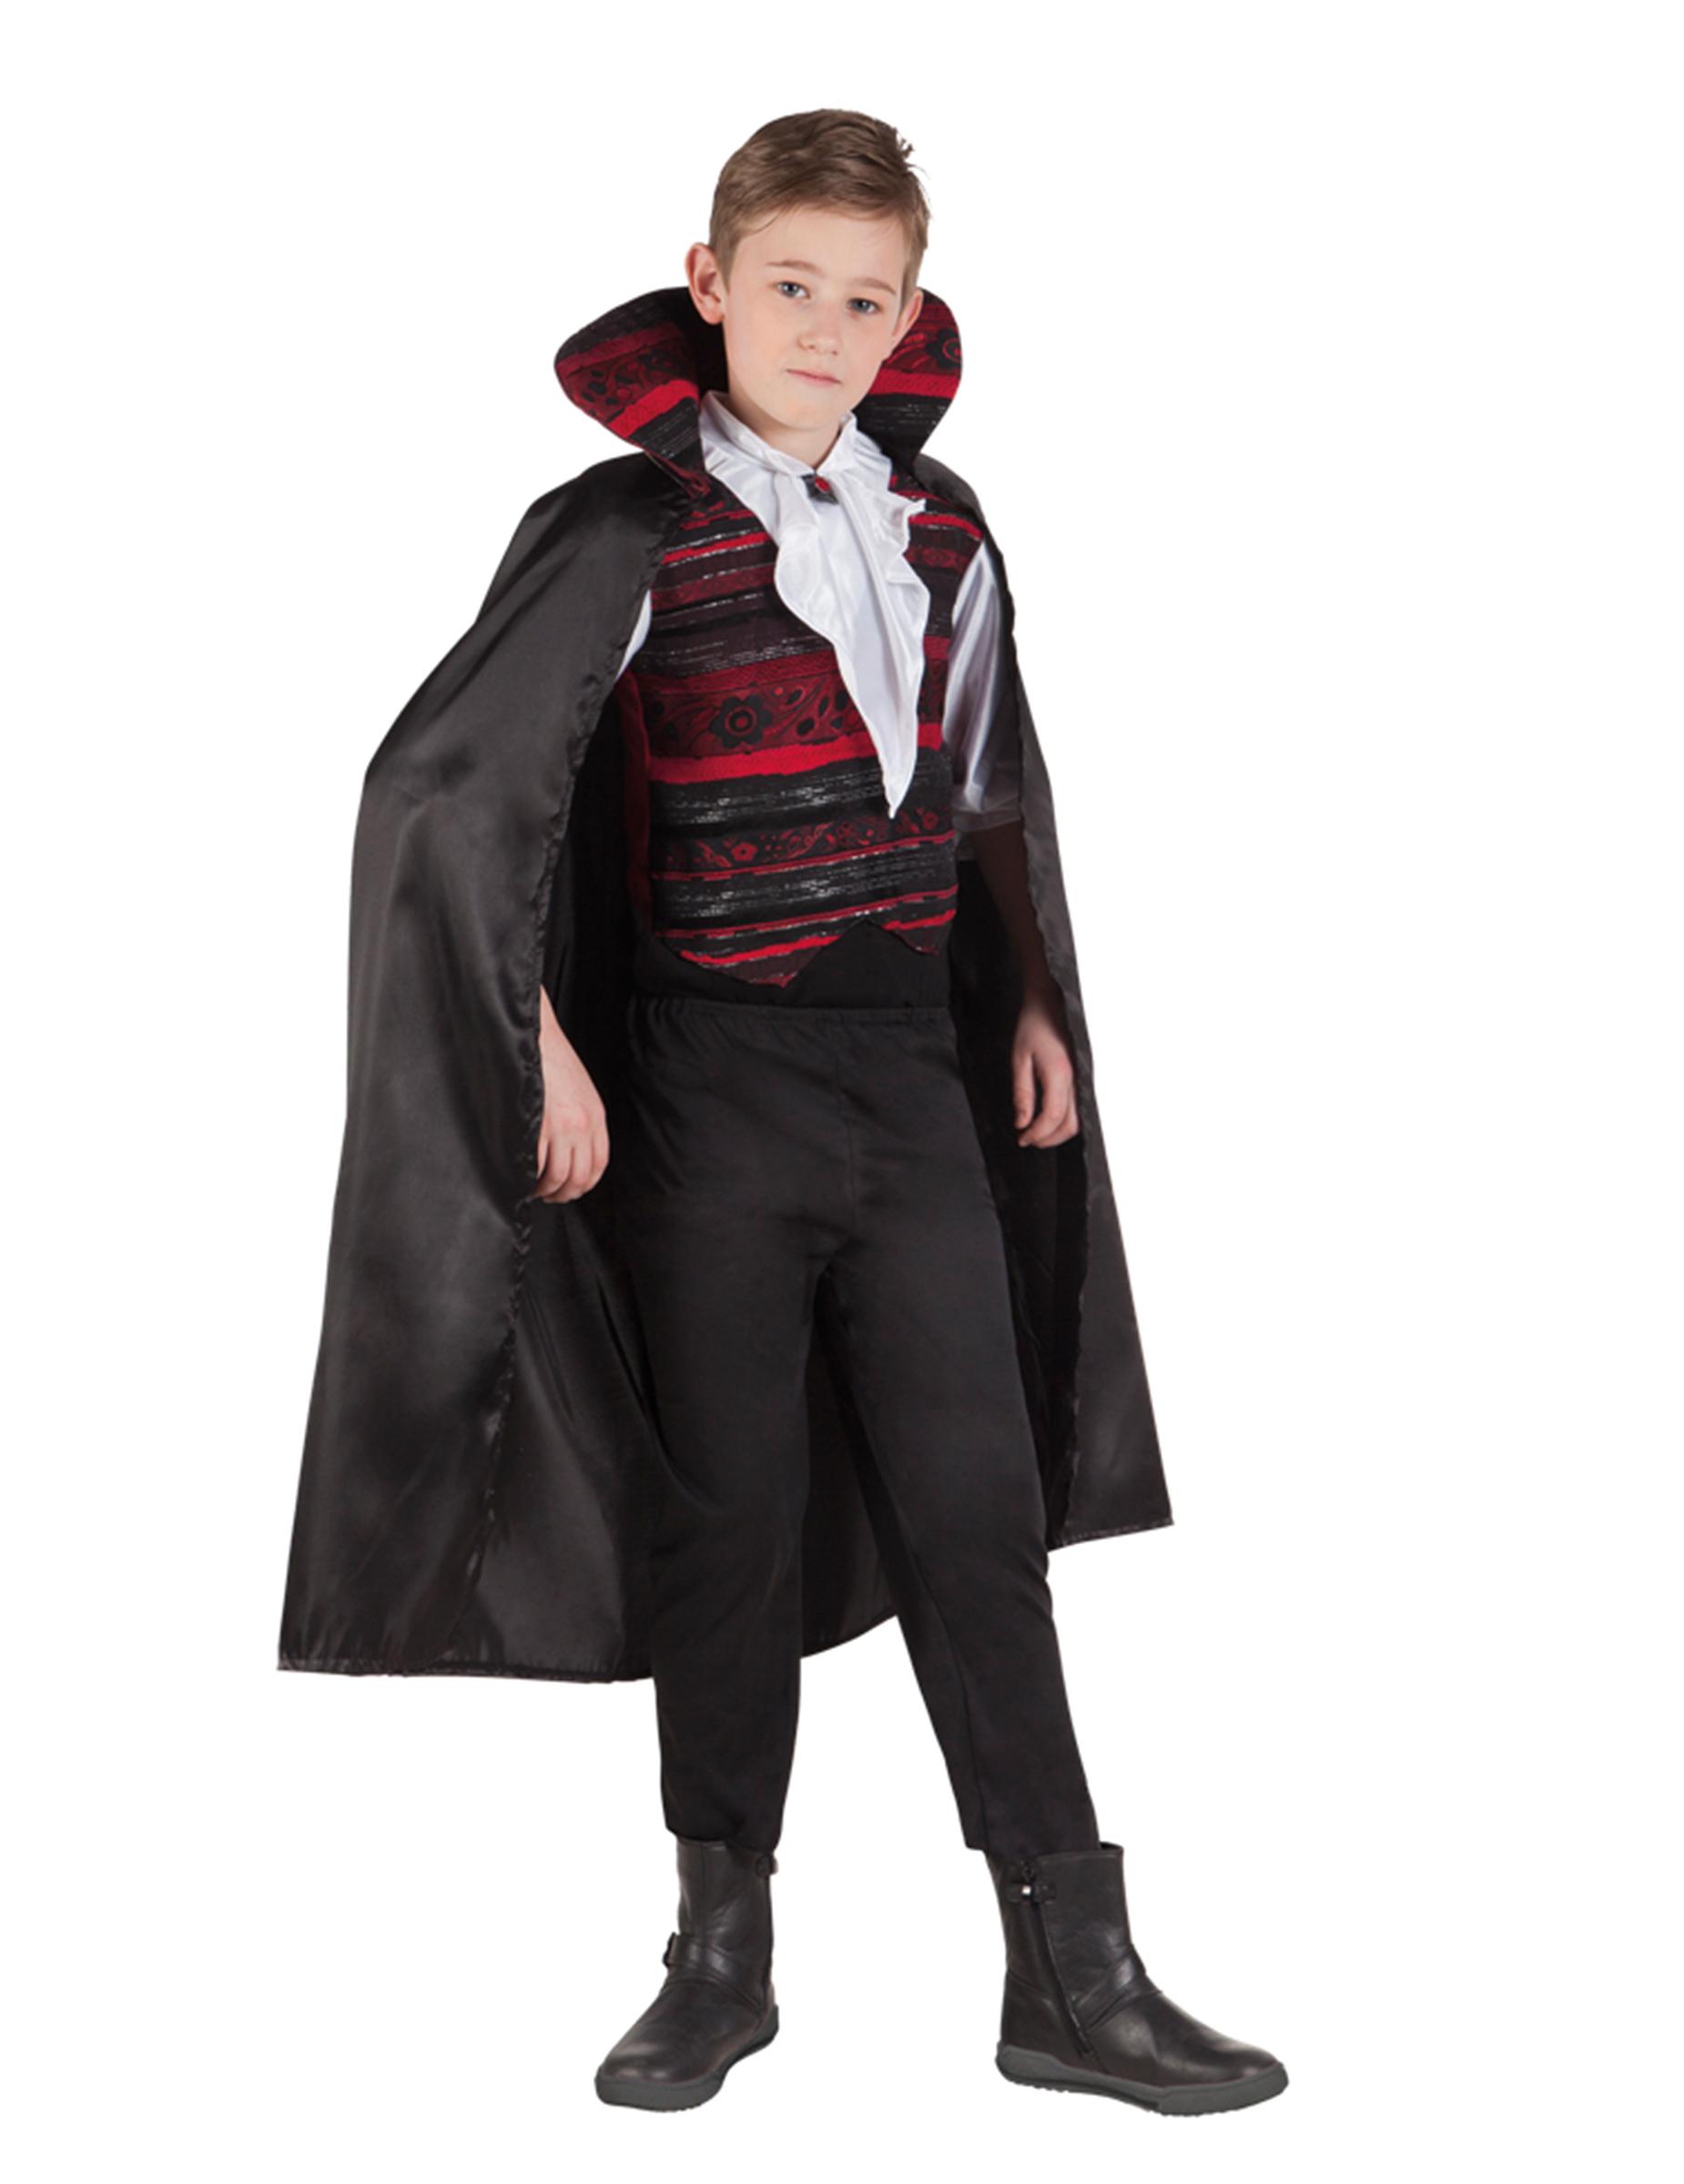 d guisement empereur vampire gar on halloween deguise toi achat de d guisements enfants. Black Bedroom Furniture Sets. Home Design Ideas